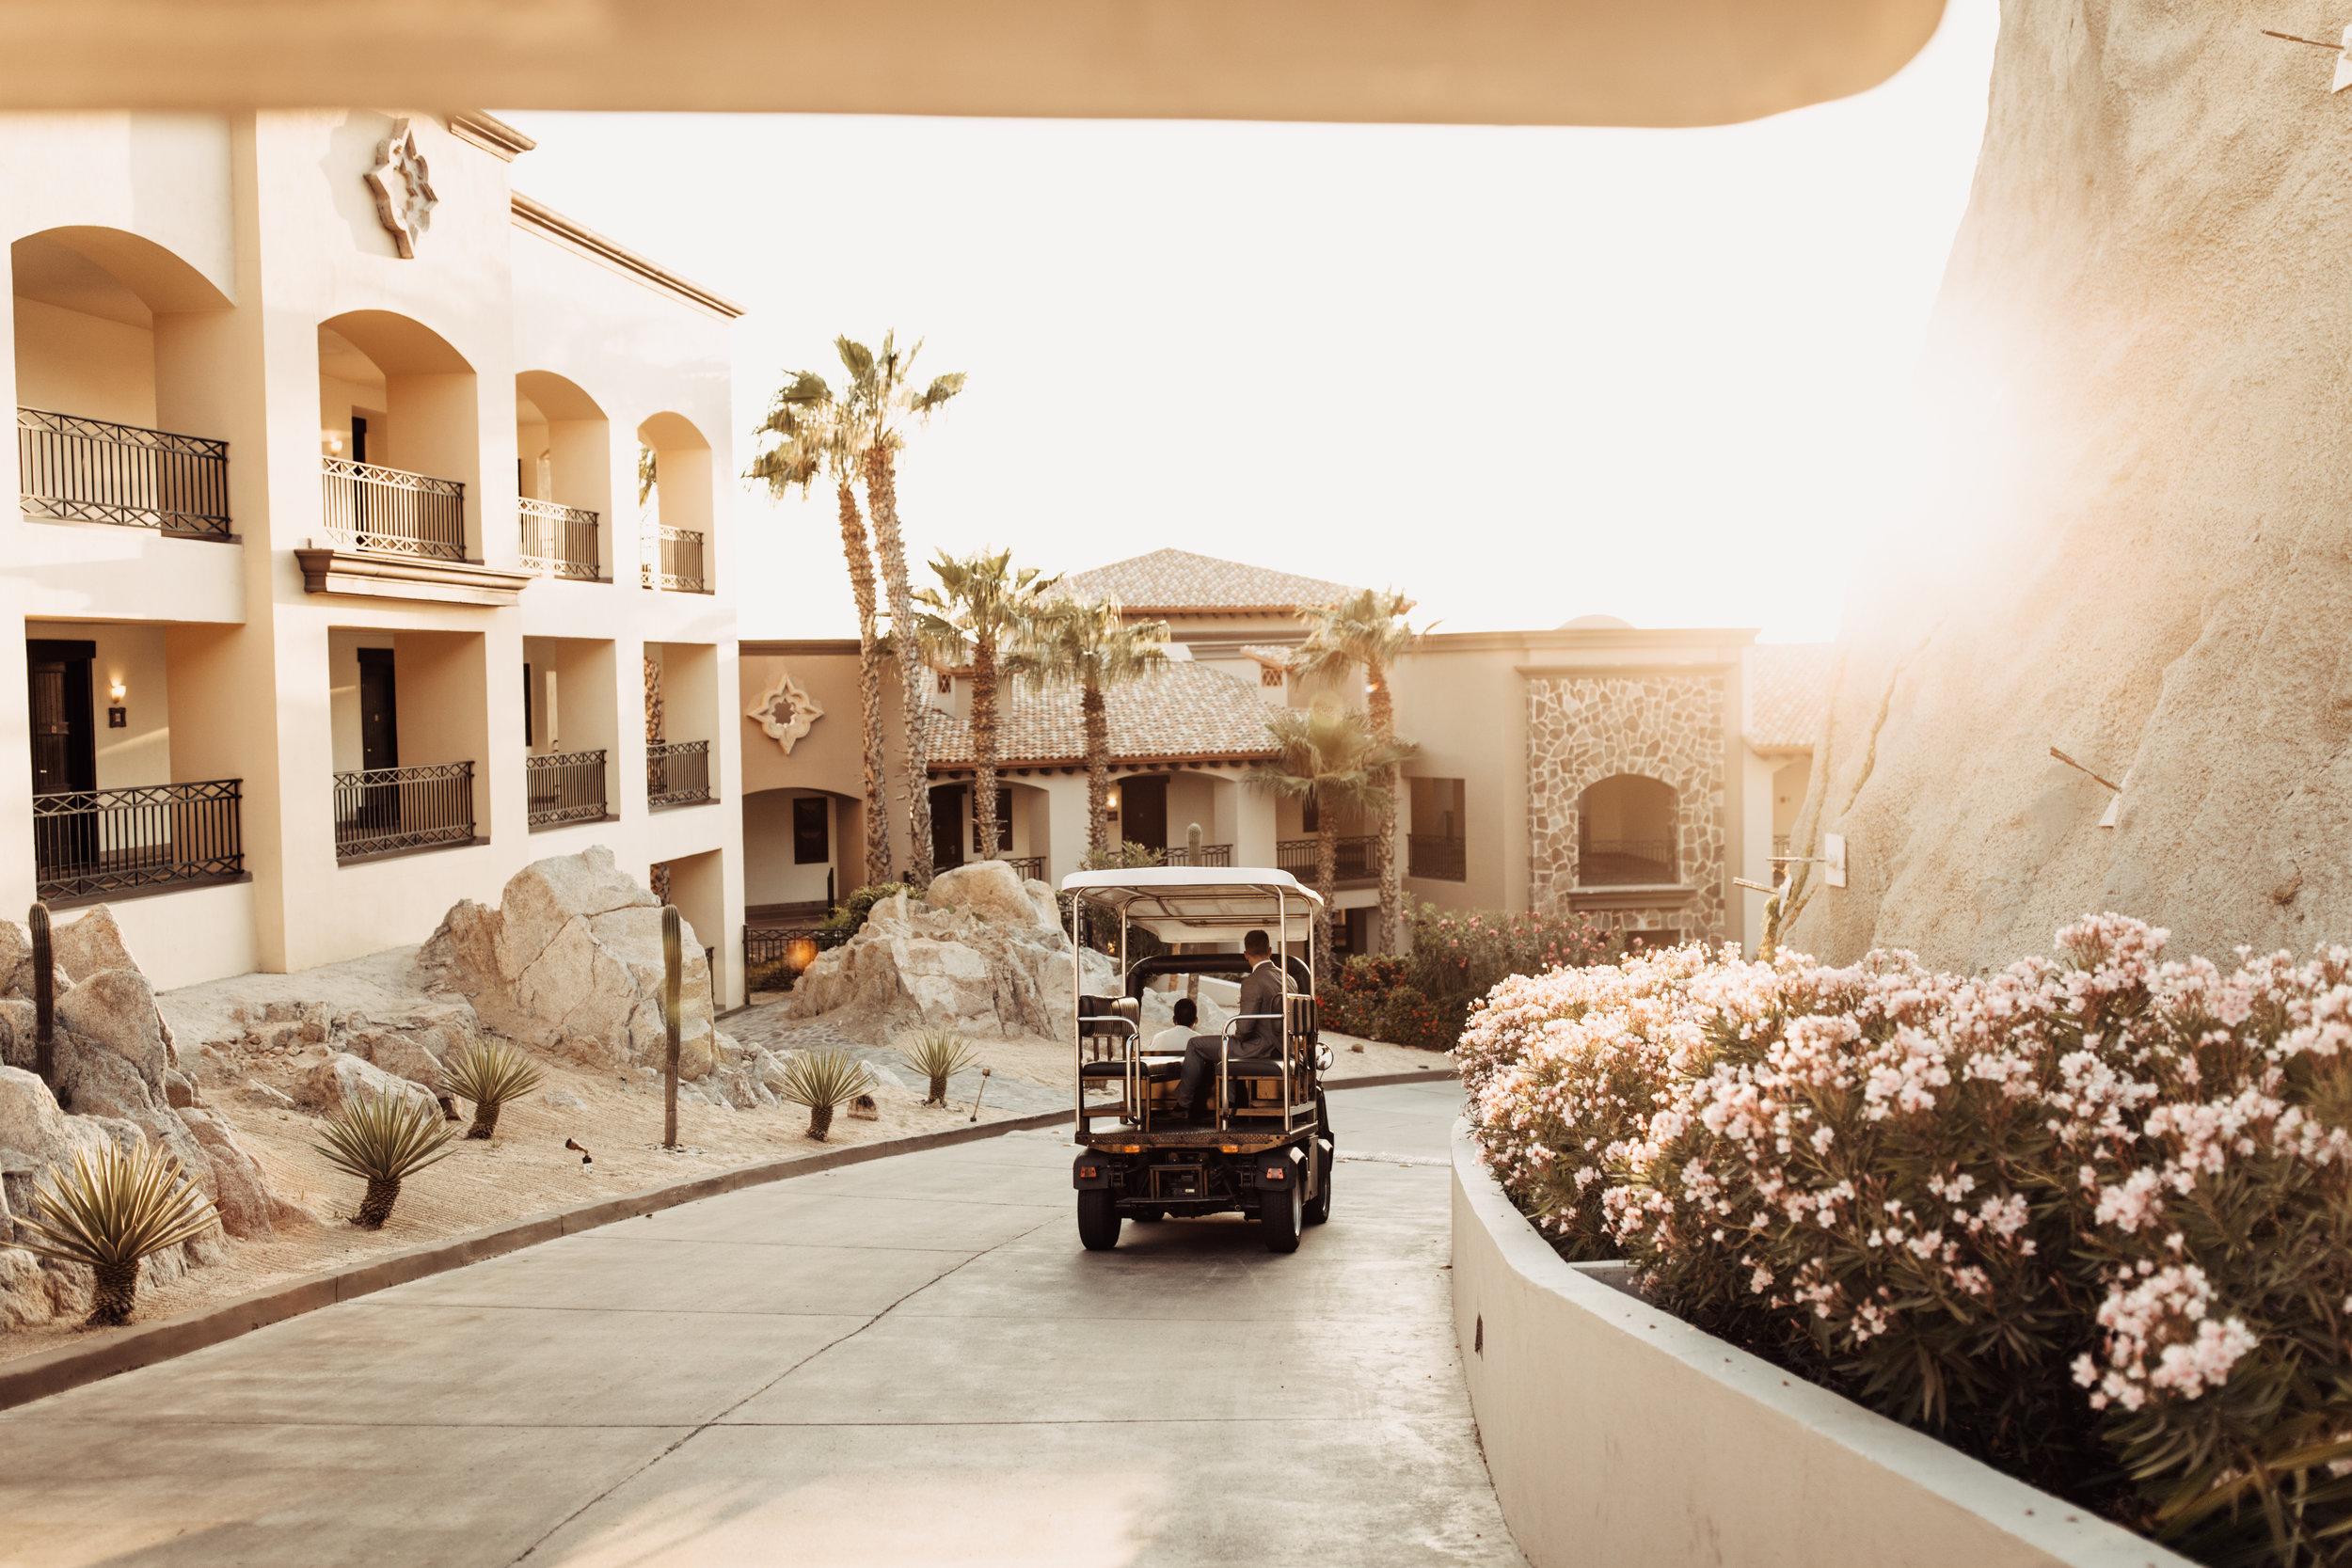 pueblo-bonito-sunset-beach-wedding-cabo-san-lucas480.jpg